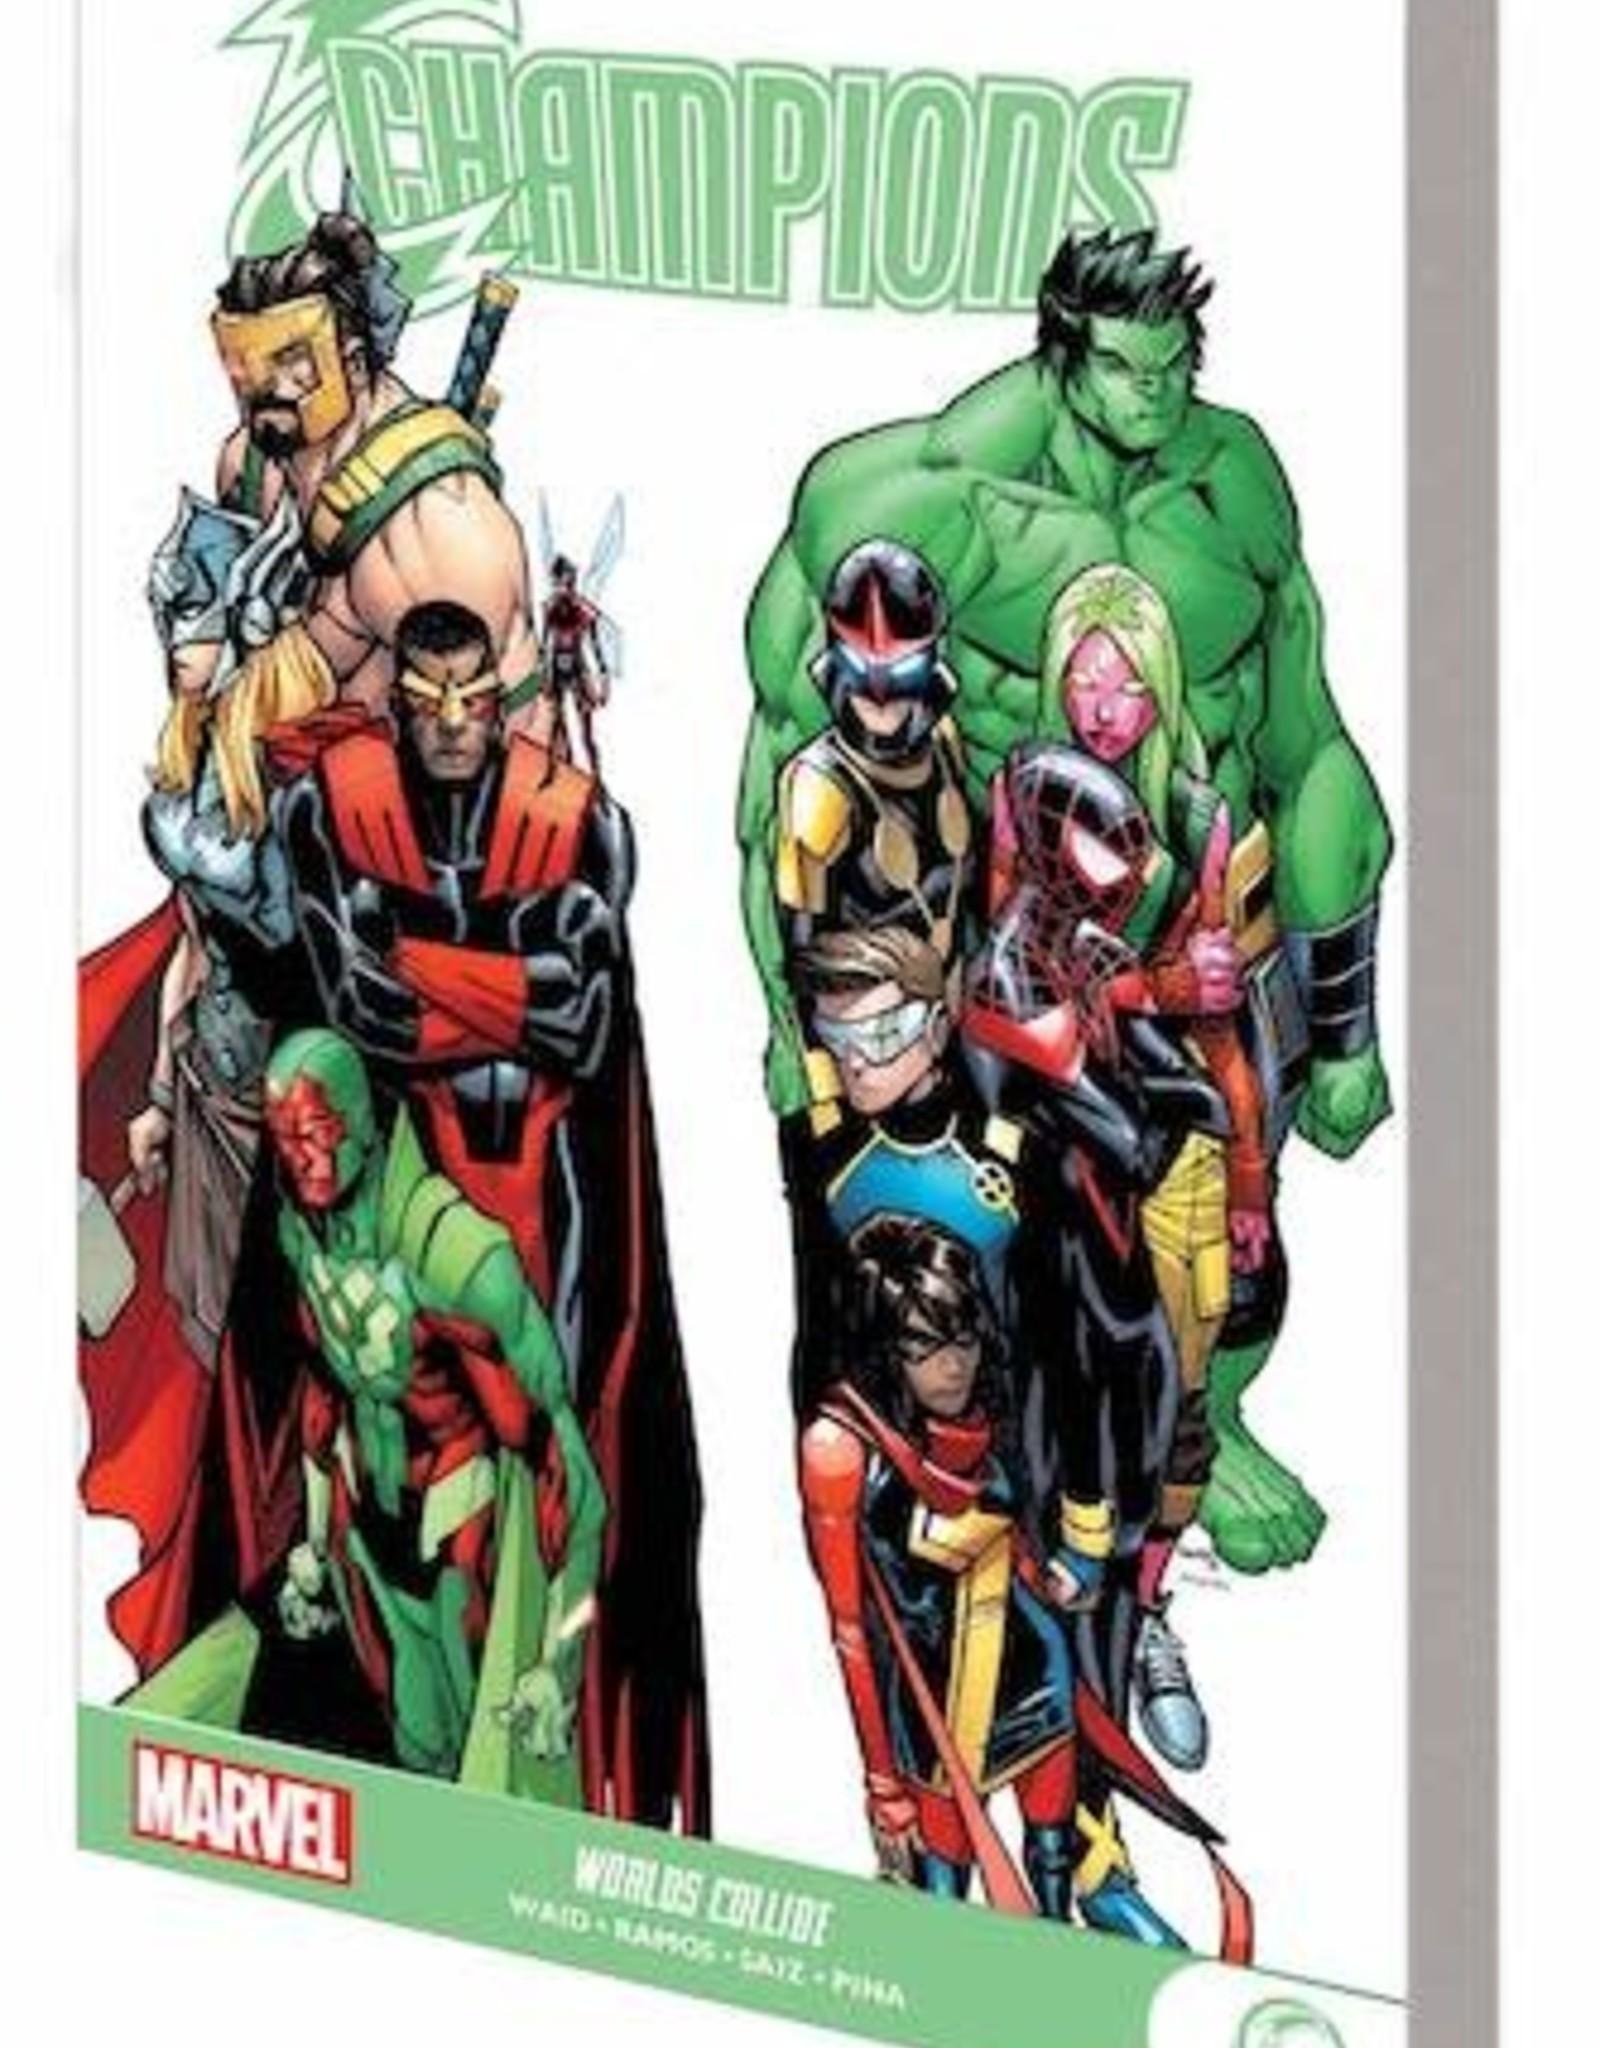 Marvel Comics Champions Gn TP Worlds Collide